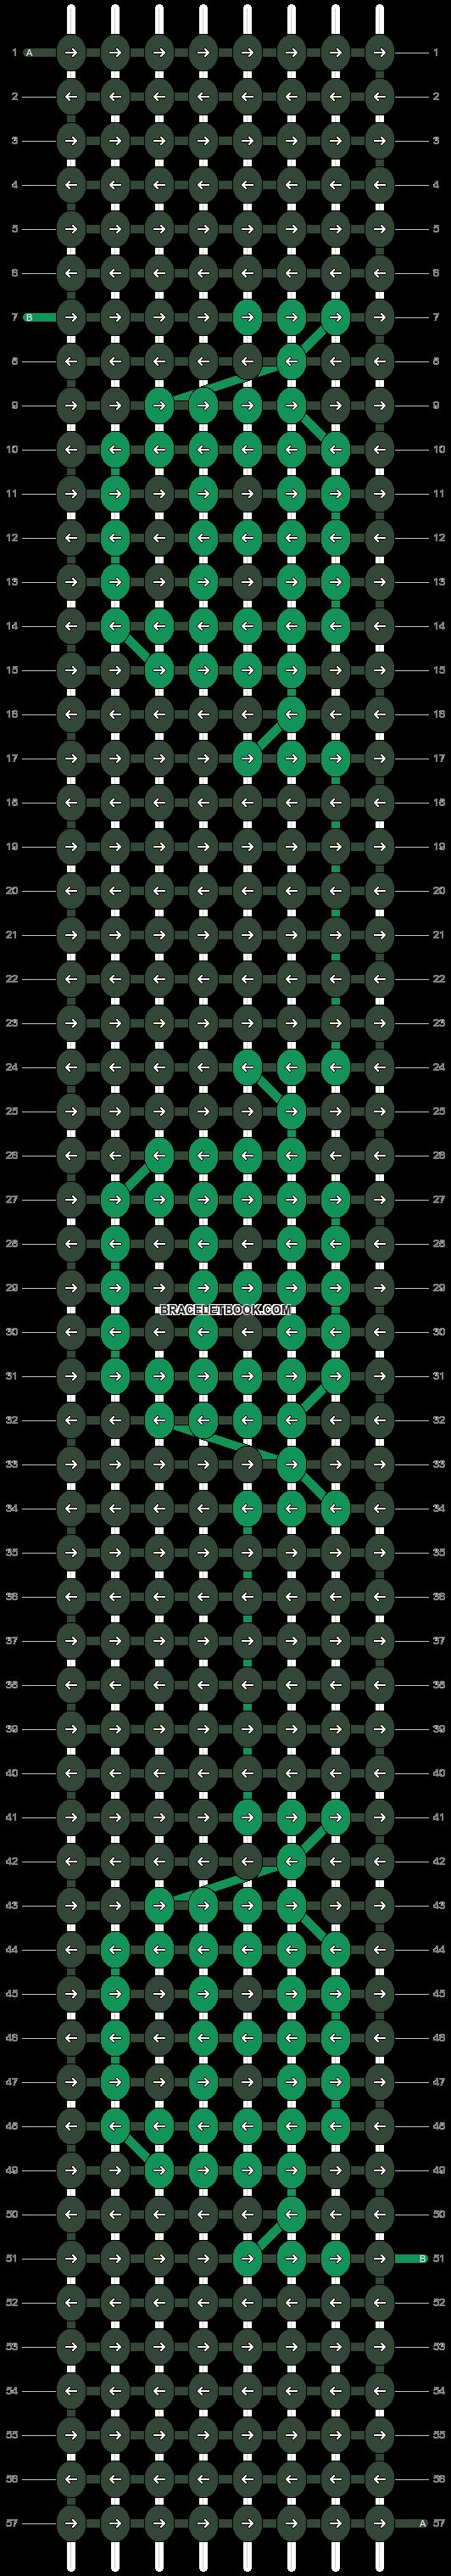 Alpha pattern #37633 pattern